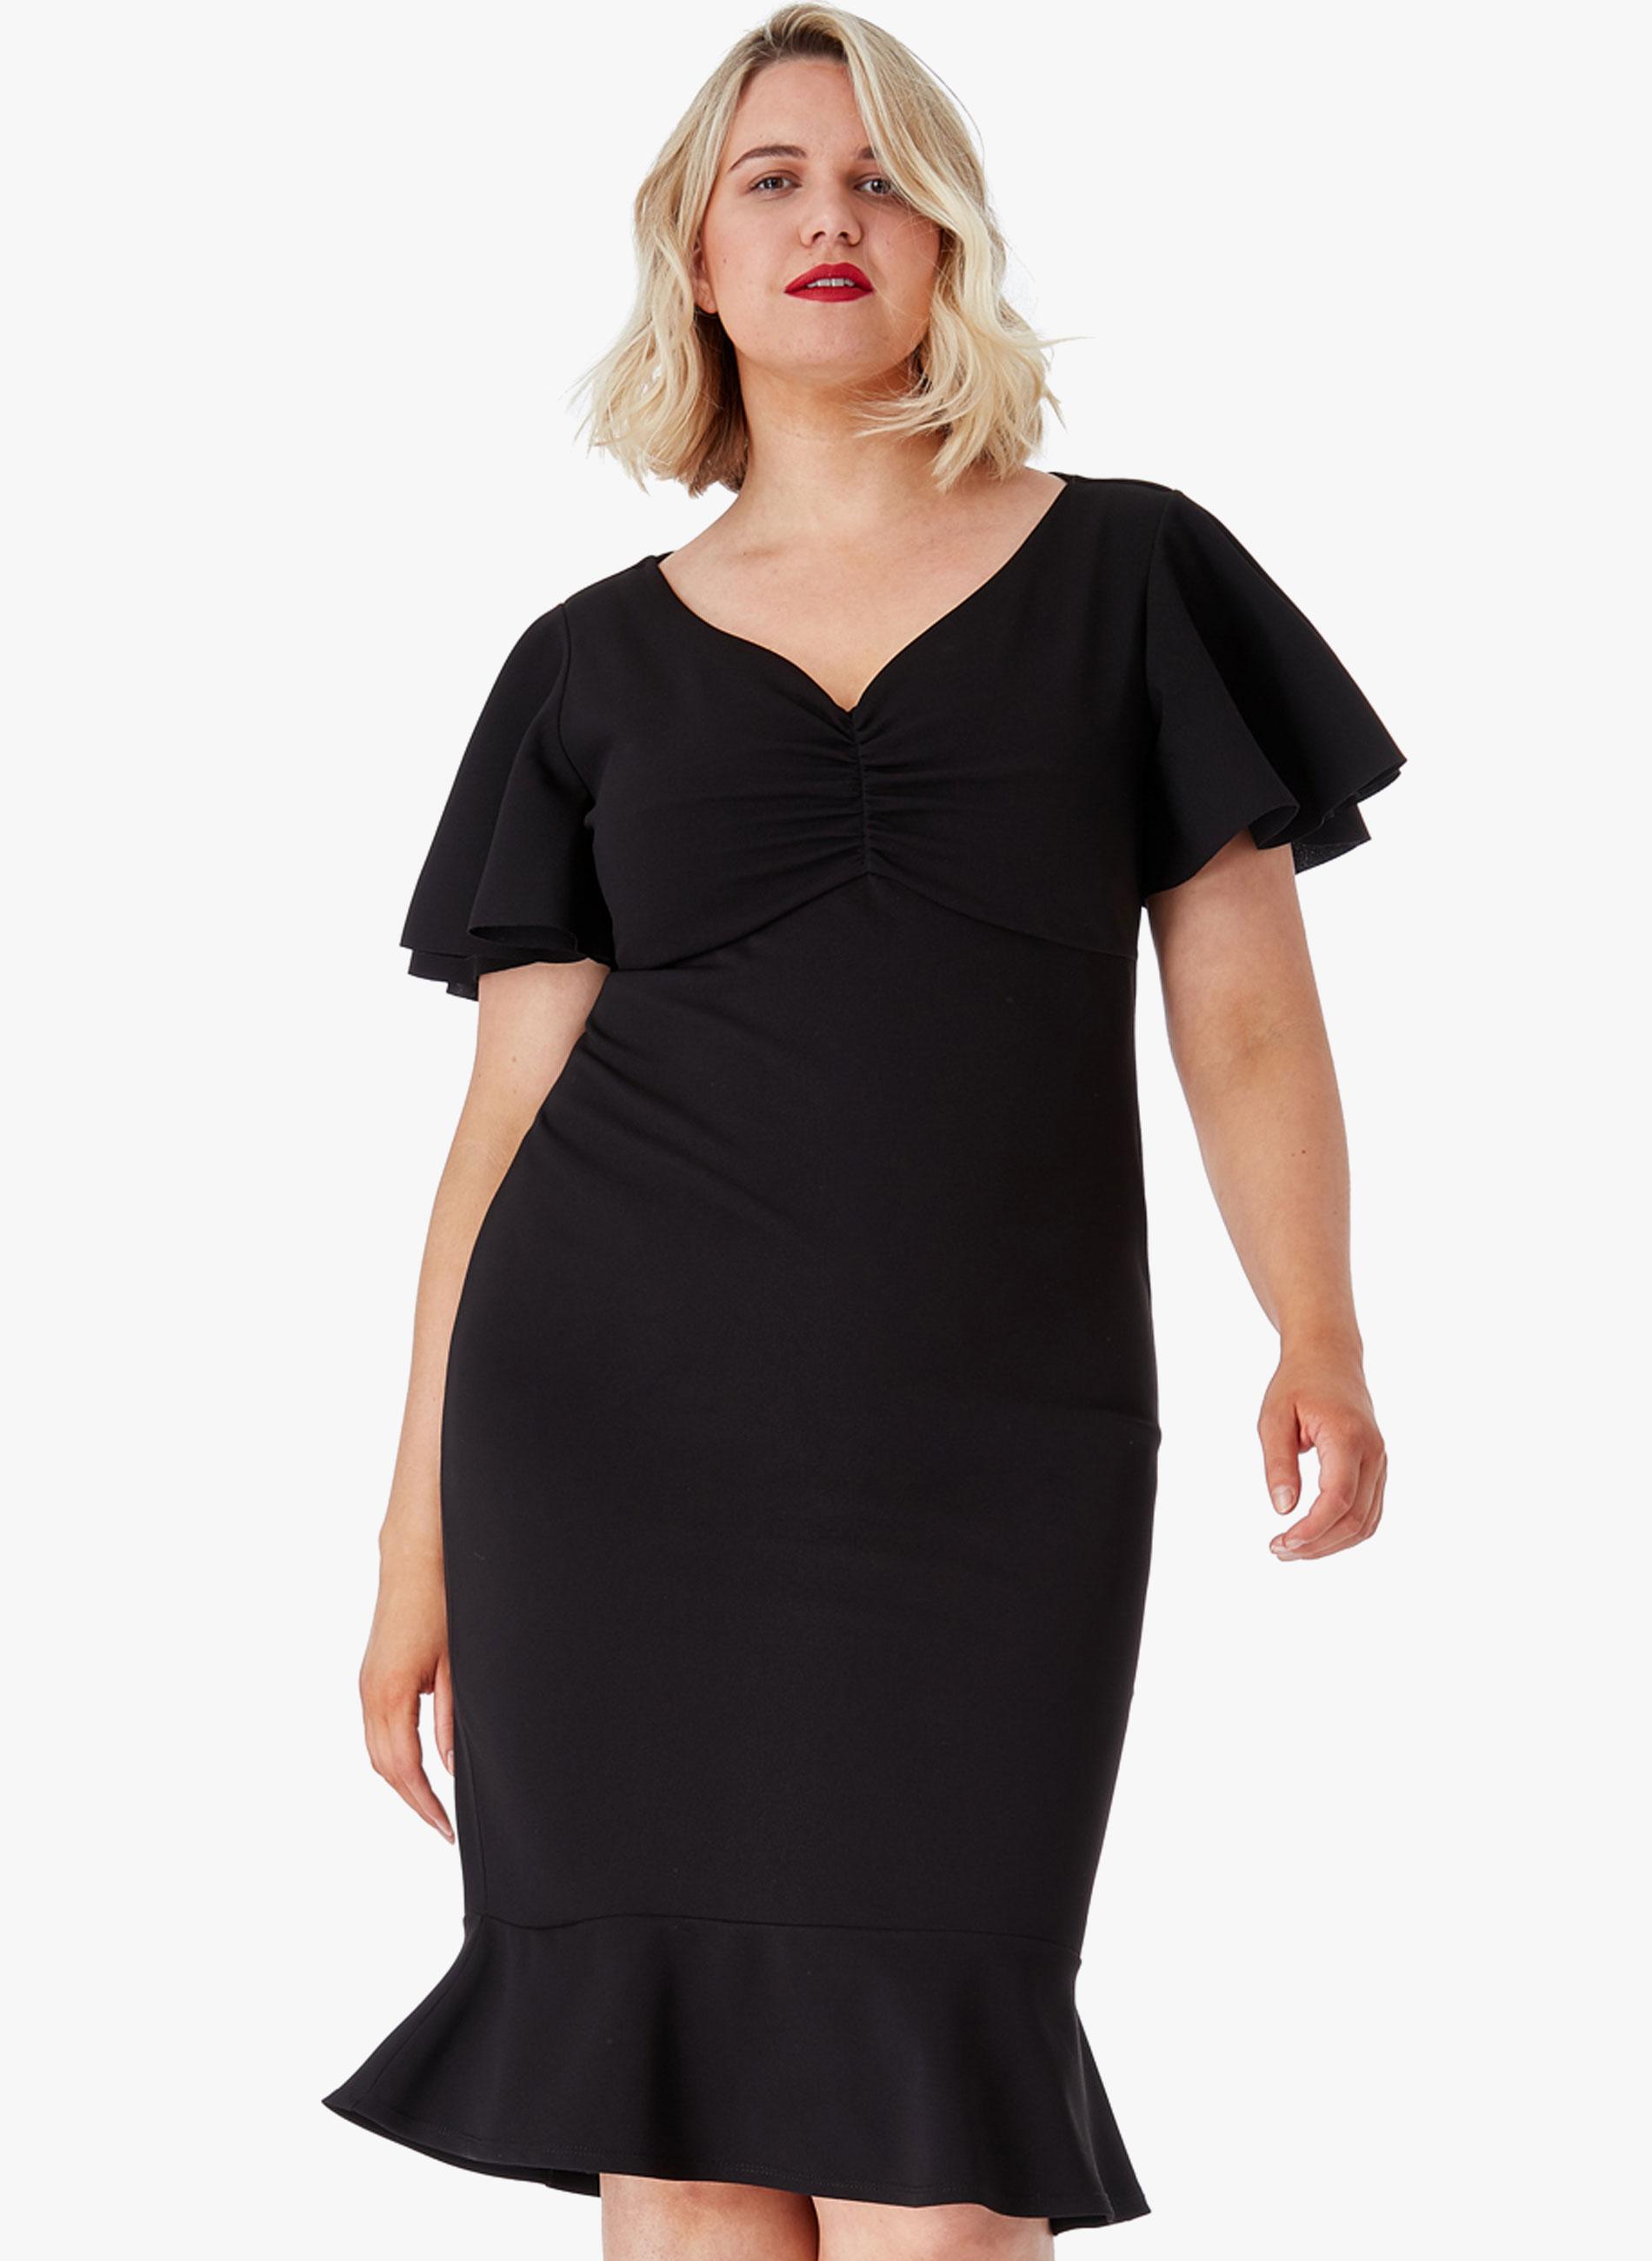 8b37a9e065b9 ΜΕΓΑΛΑ ΜΕΓΕΘΗ ΦΟΡΕΜΑΤΑ    Φόρεμα Midi Μαύρο - Μόδα σε μεγάλα μεγέθη ...